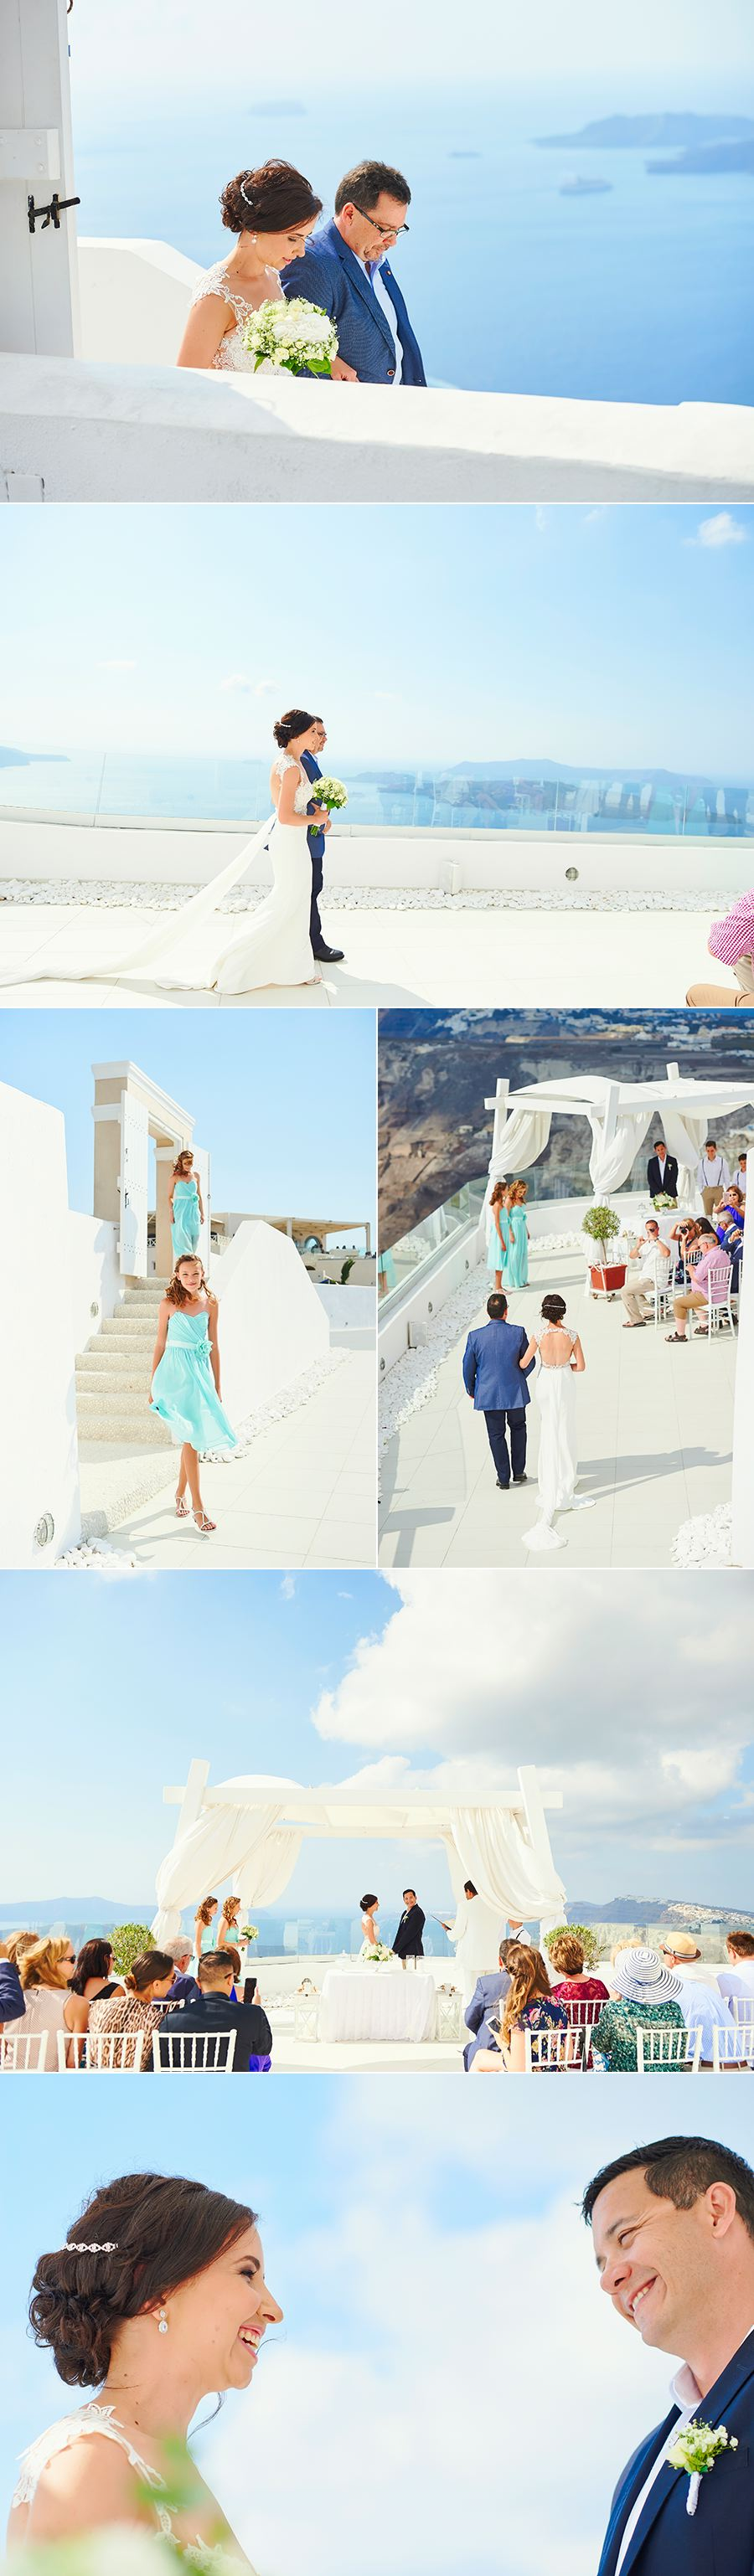 paul-simone-wedding-photos-05